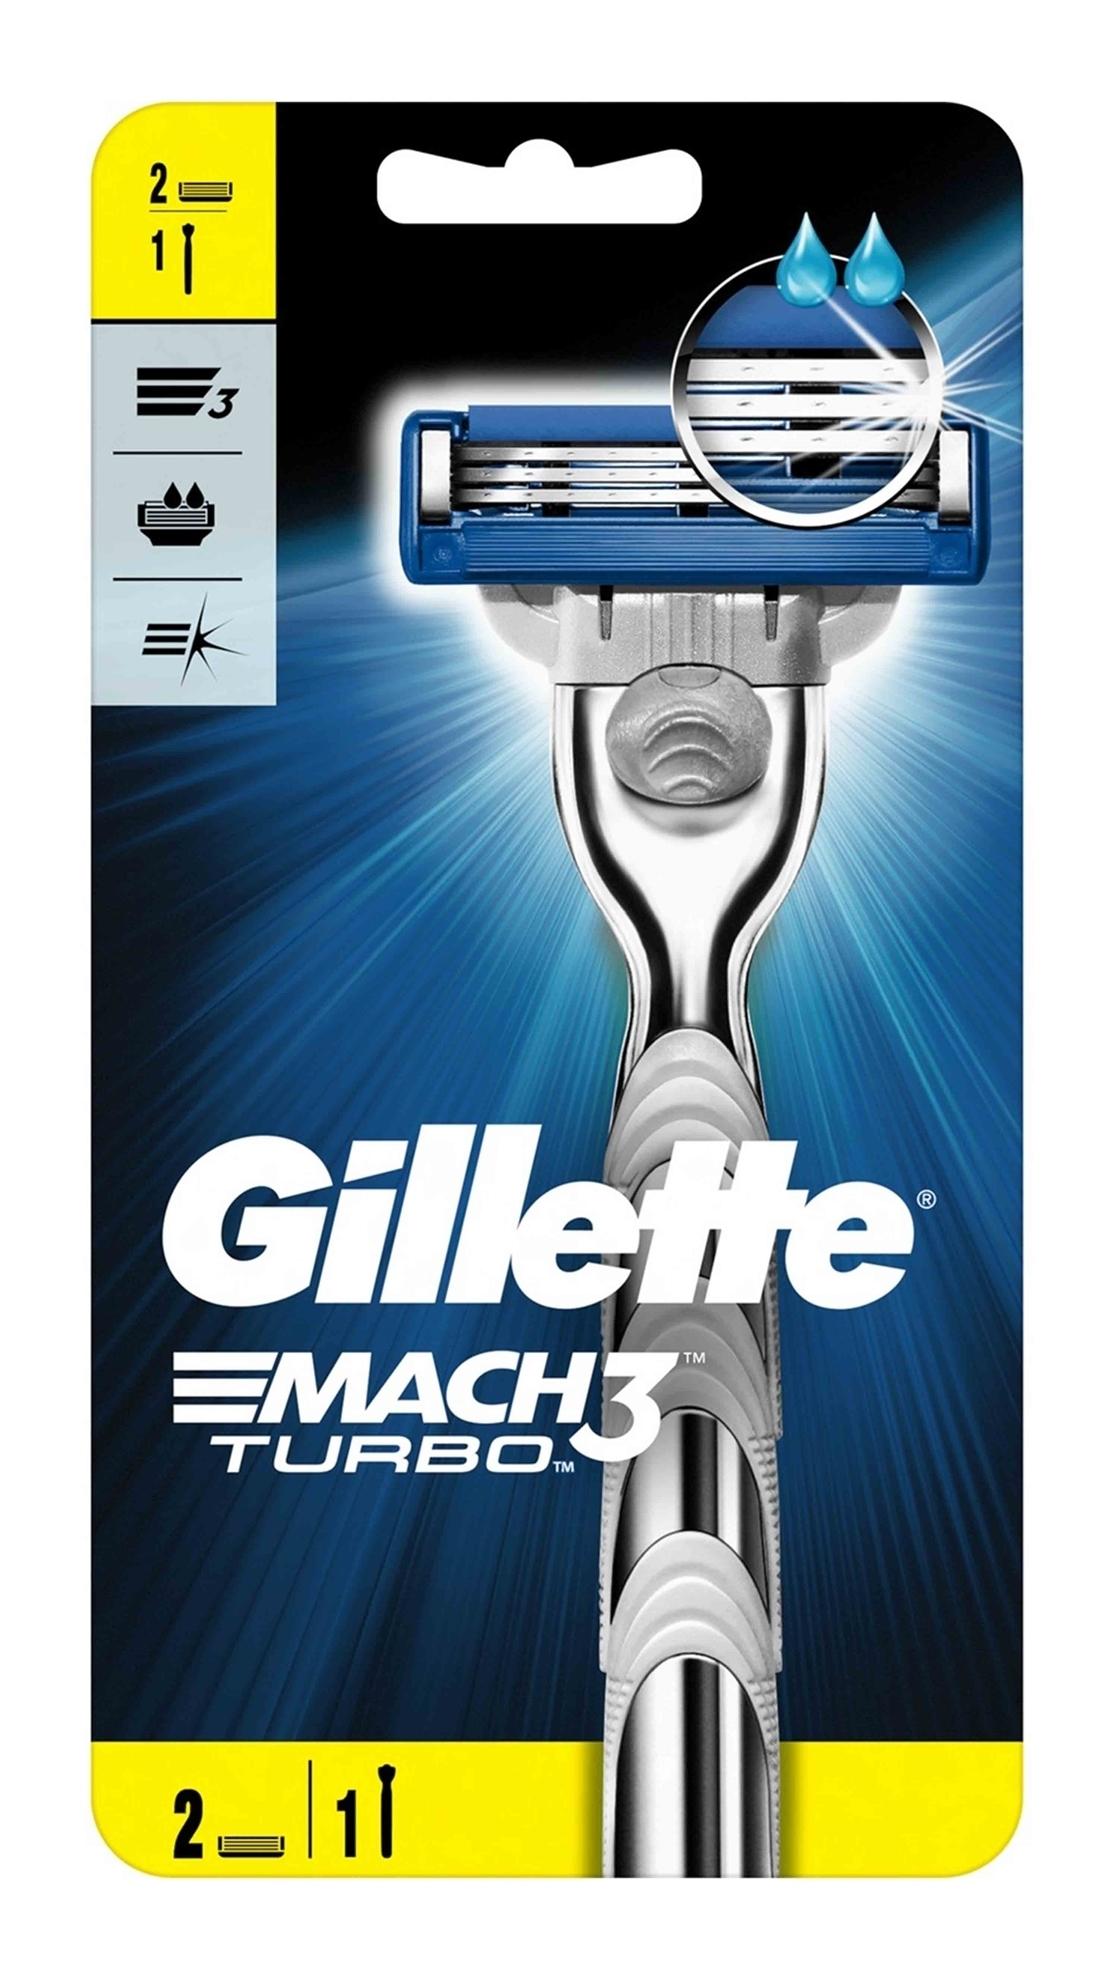 Бритвенный станок Gillette Mach3 Turbo с 2 кассетами